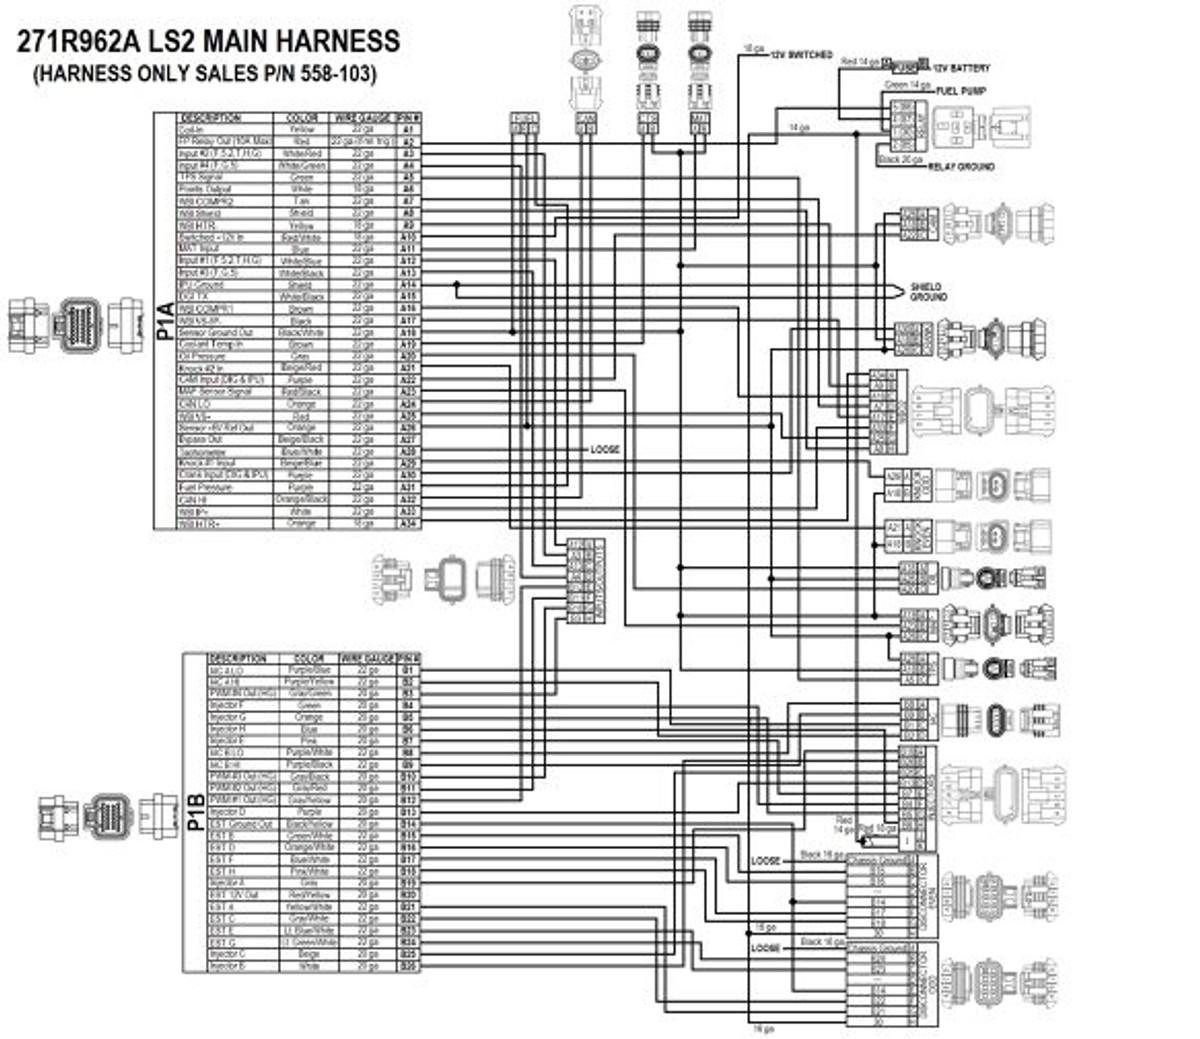 holley ls hp efi ecu  u0026 harness kit 550 602n 24x reluctor